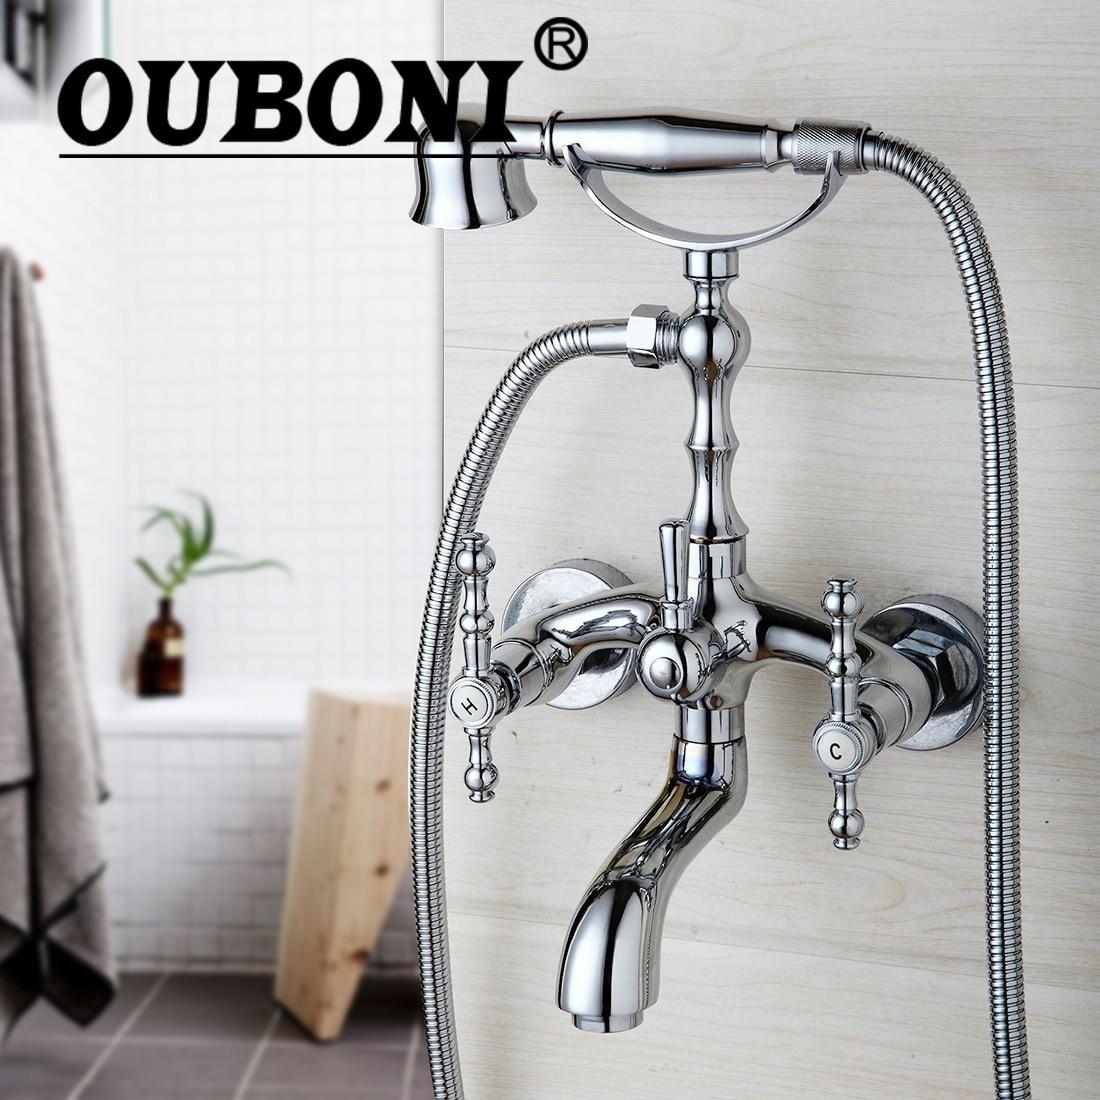 OUBONI Shower Set Chrome Telephone Install Bathroom Sink Faucet Bathtub Basin Mixer Tap With Shower Hand недорого